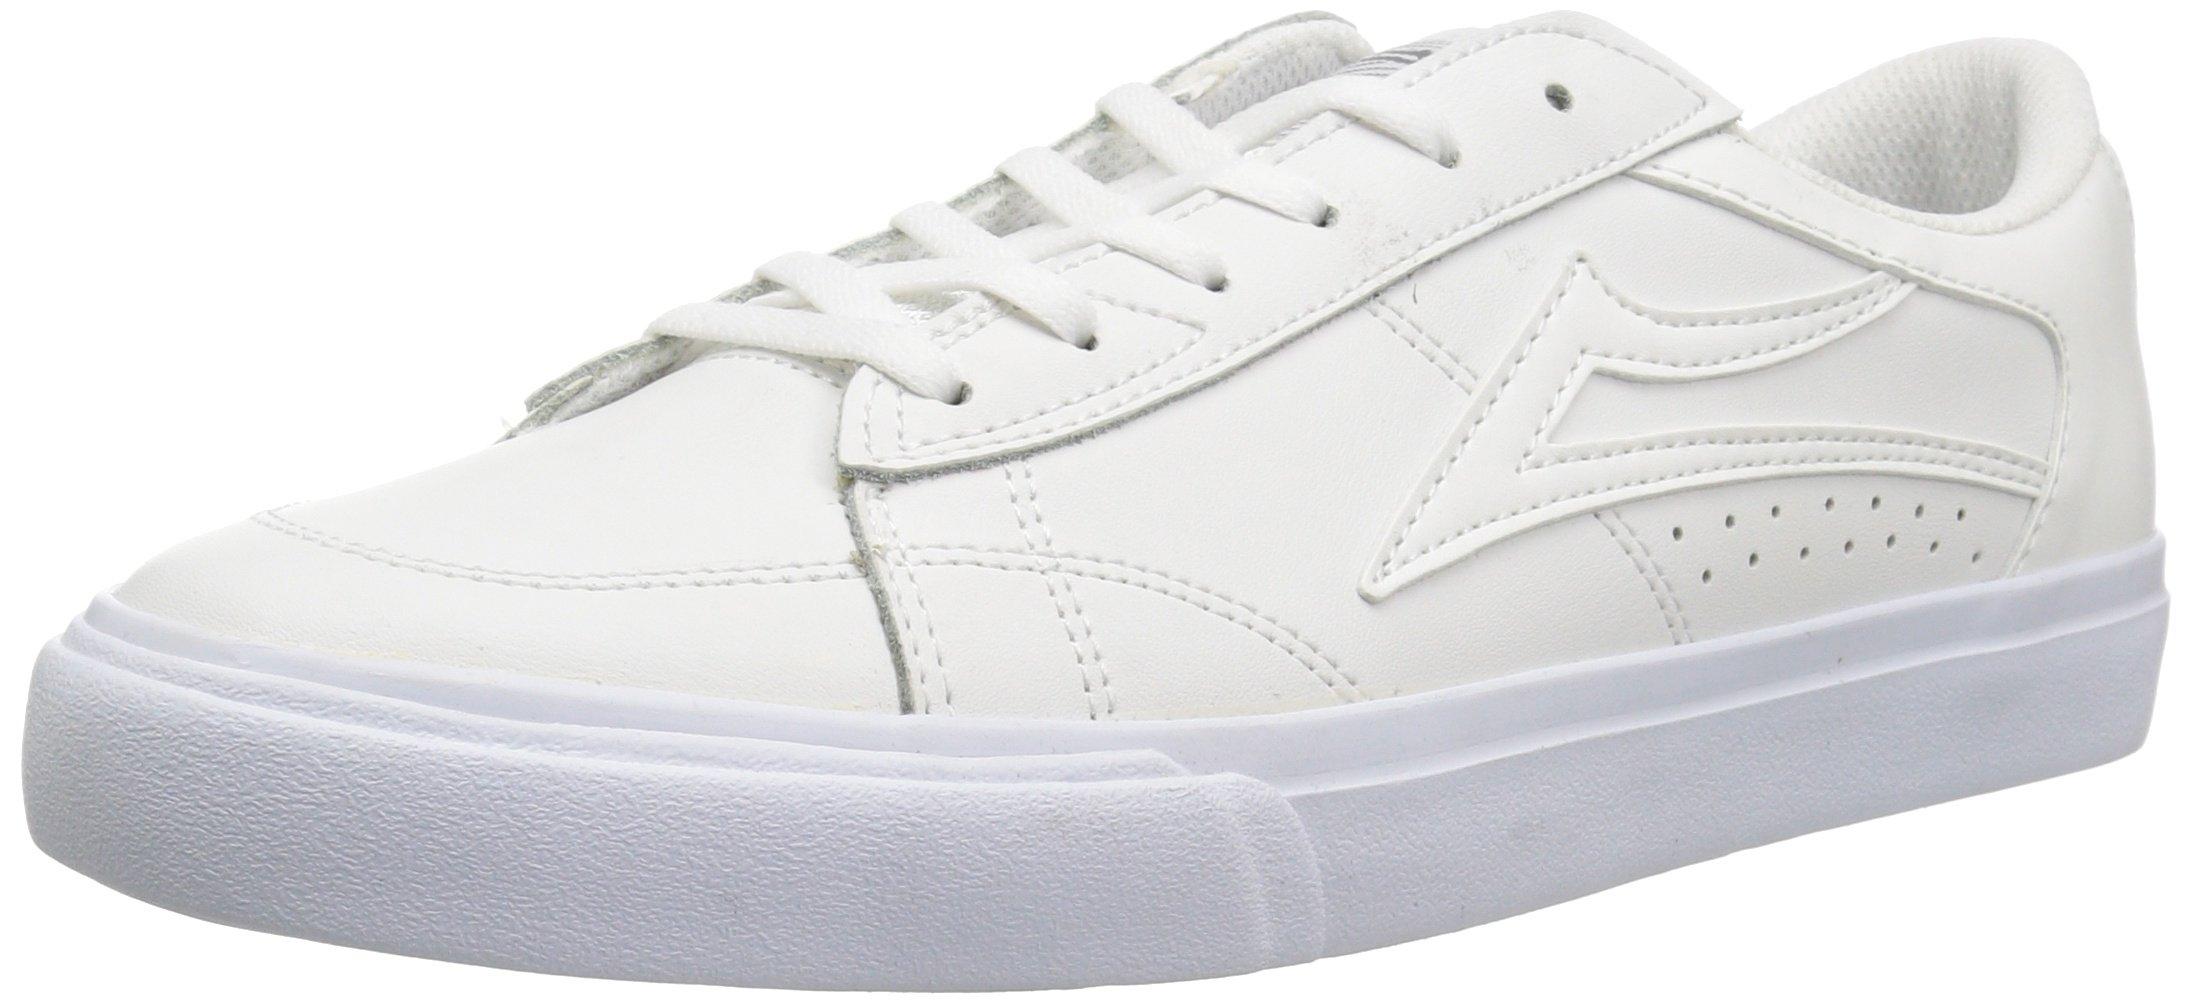 Lakai Ellis, White Leather, 13 Medium US